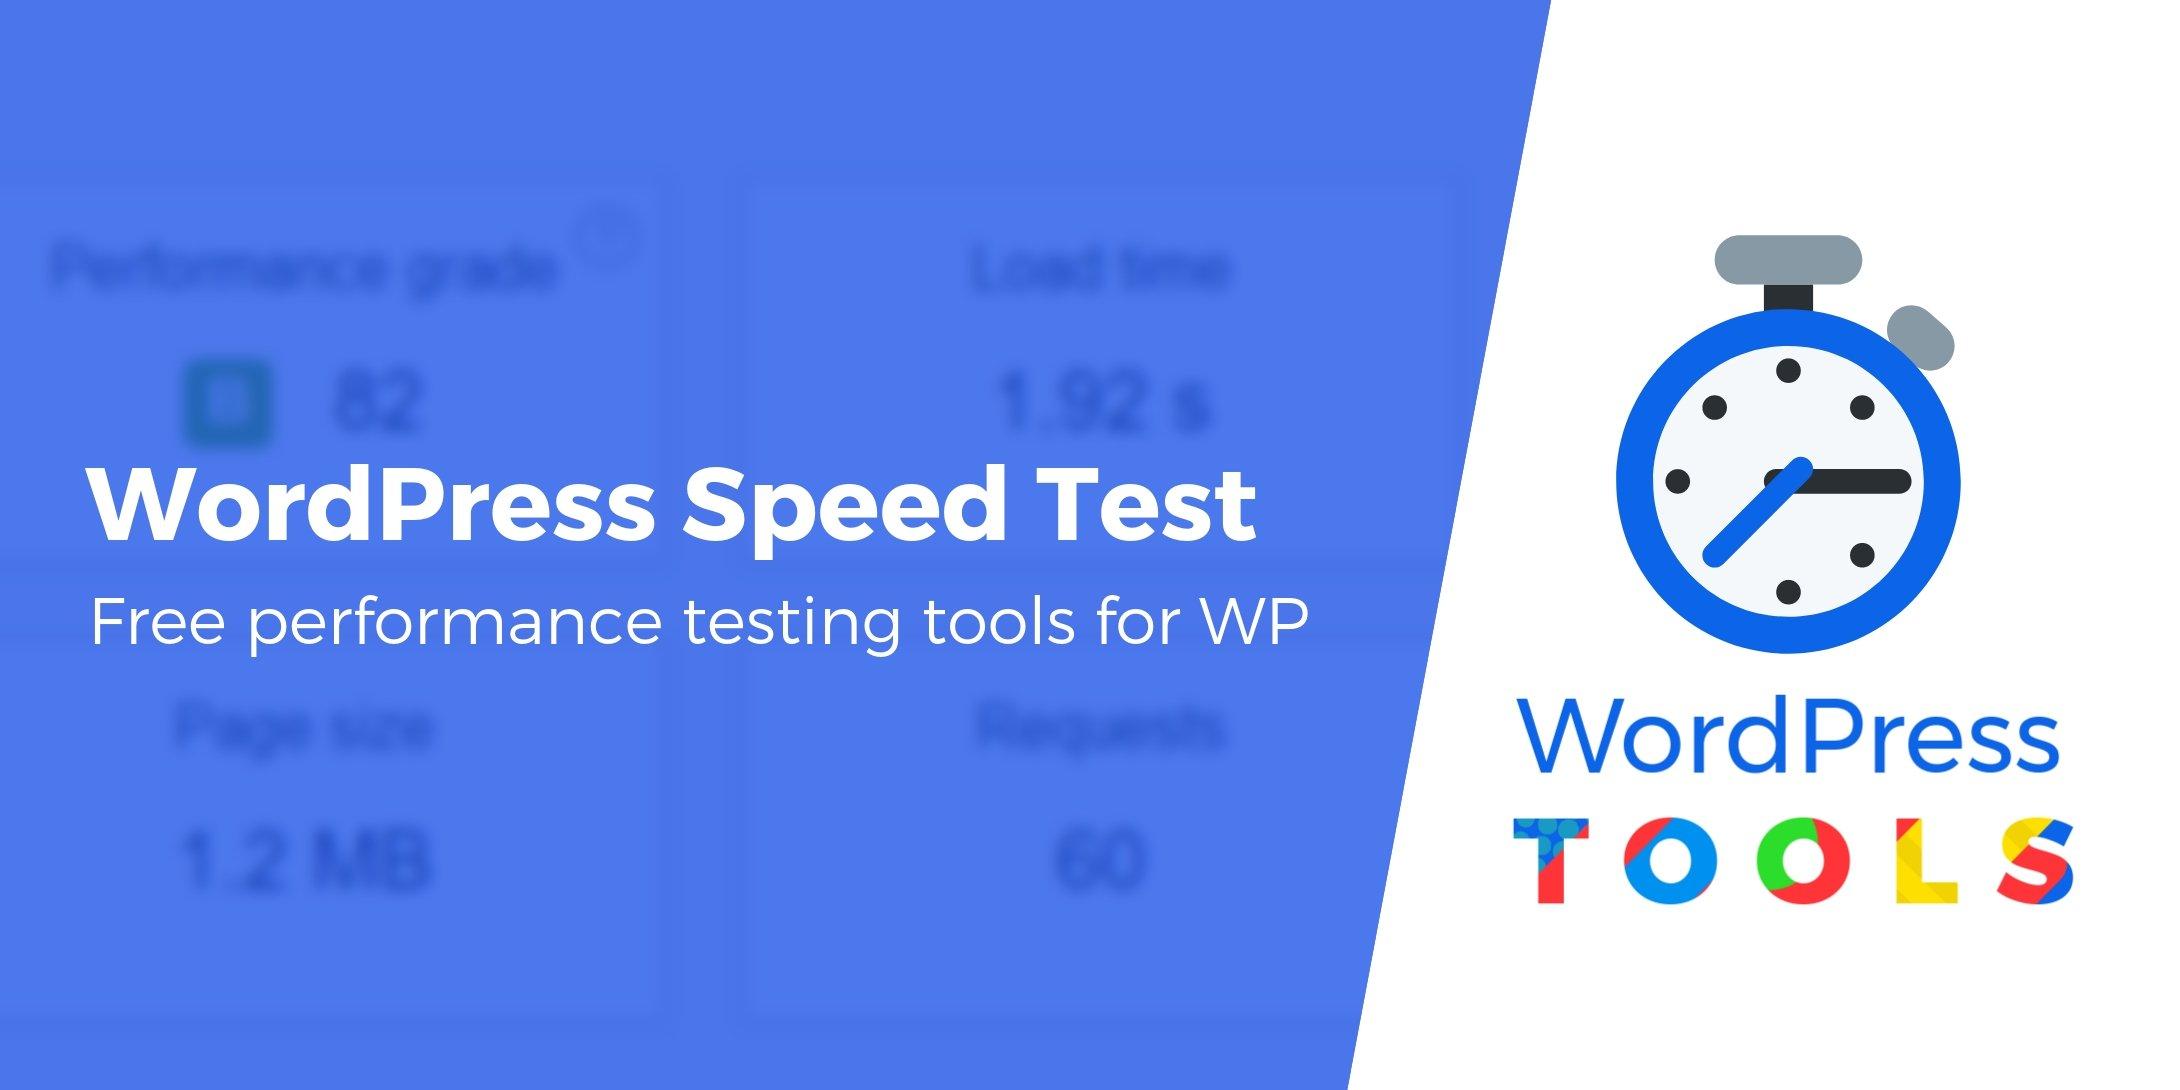 WordPress speed test